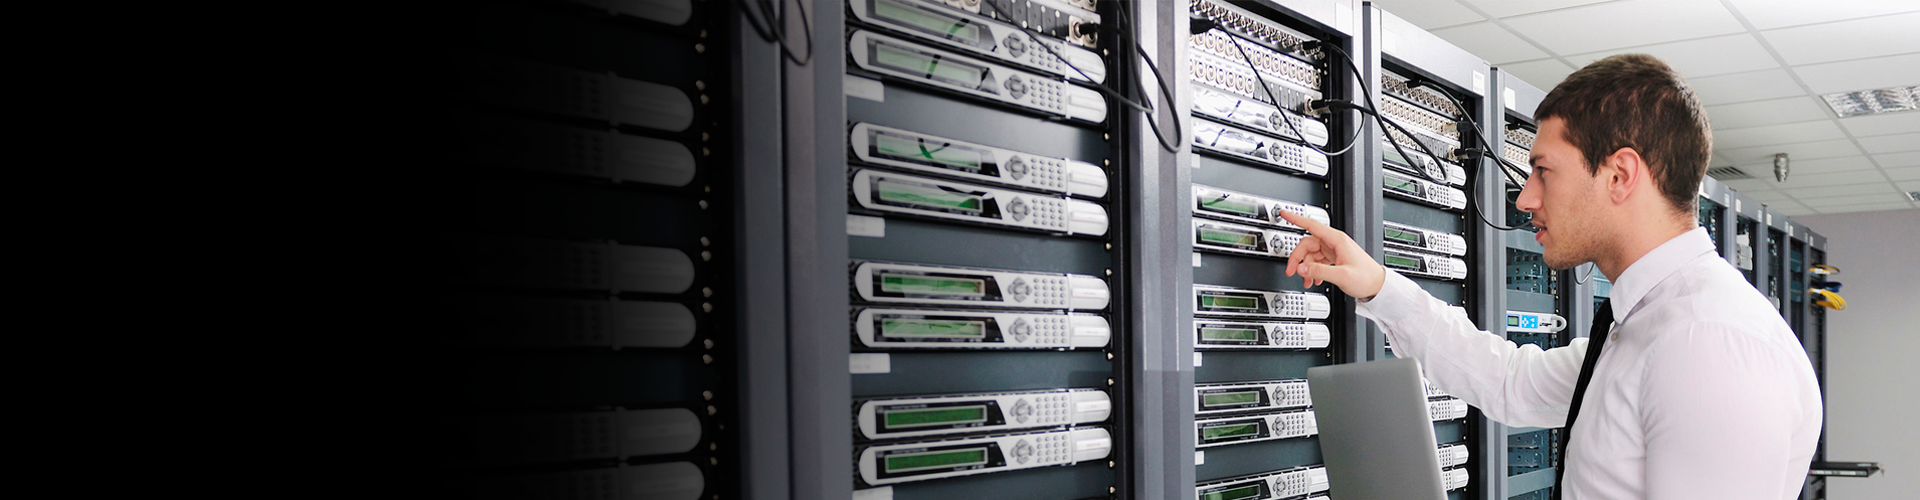 solucion implementacion de data center lima